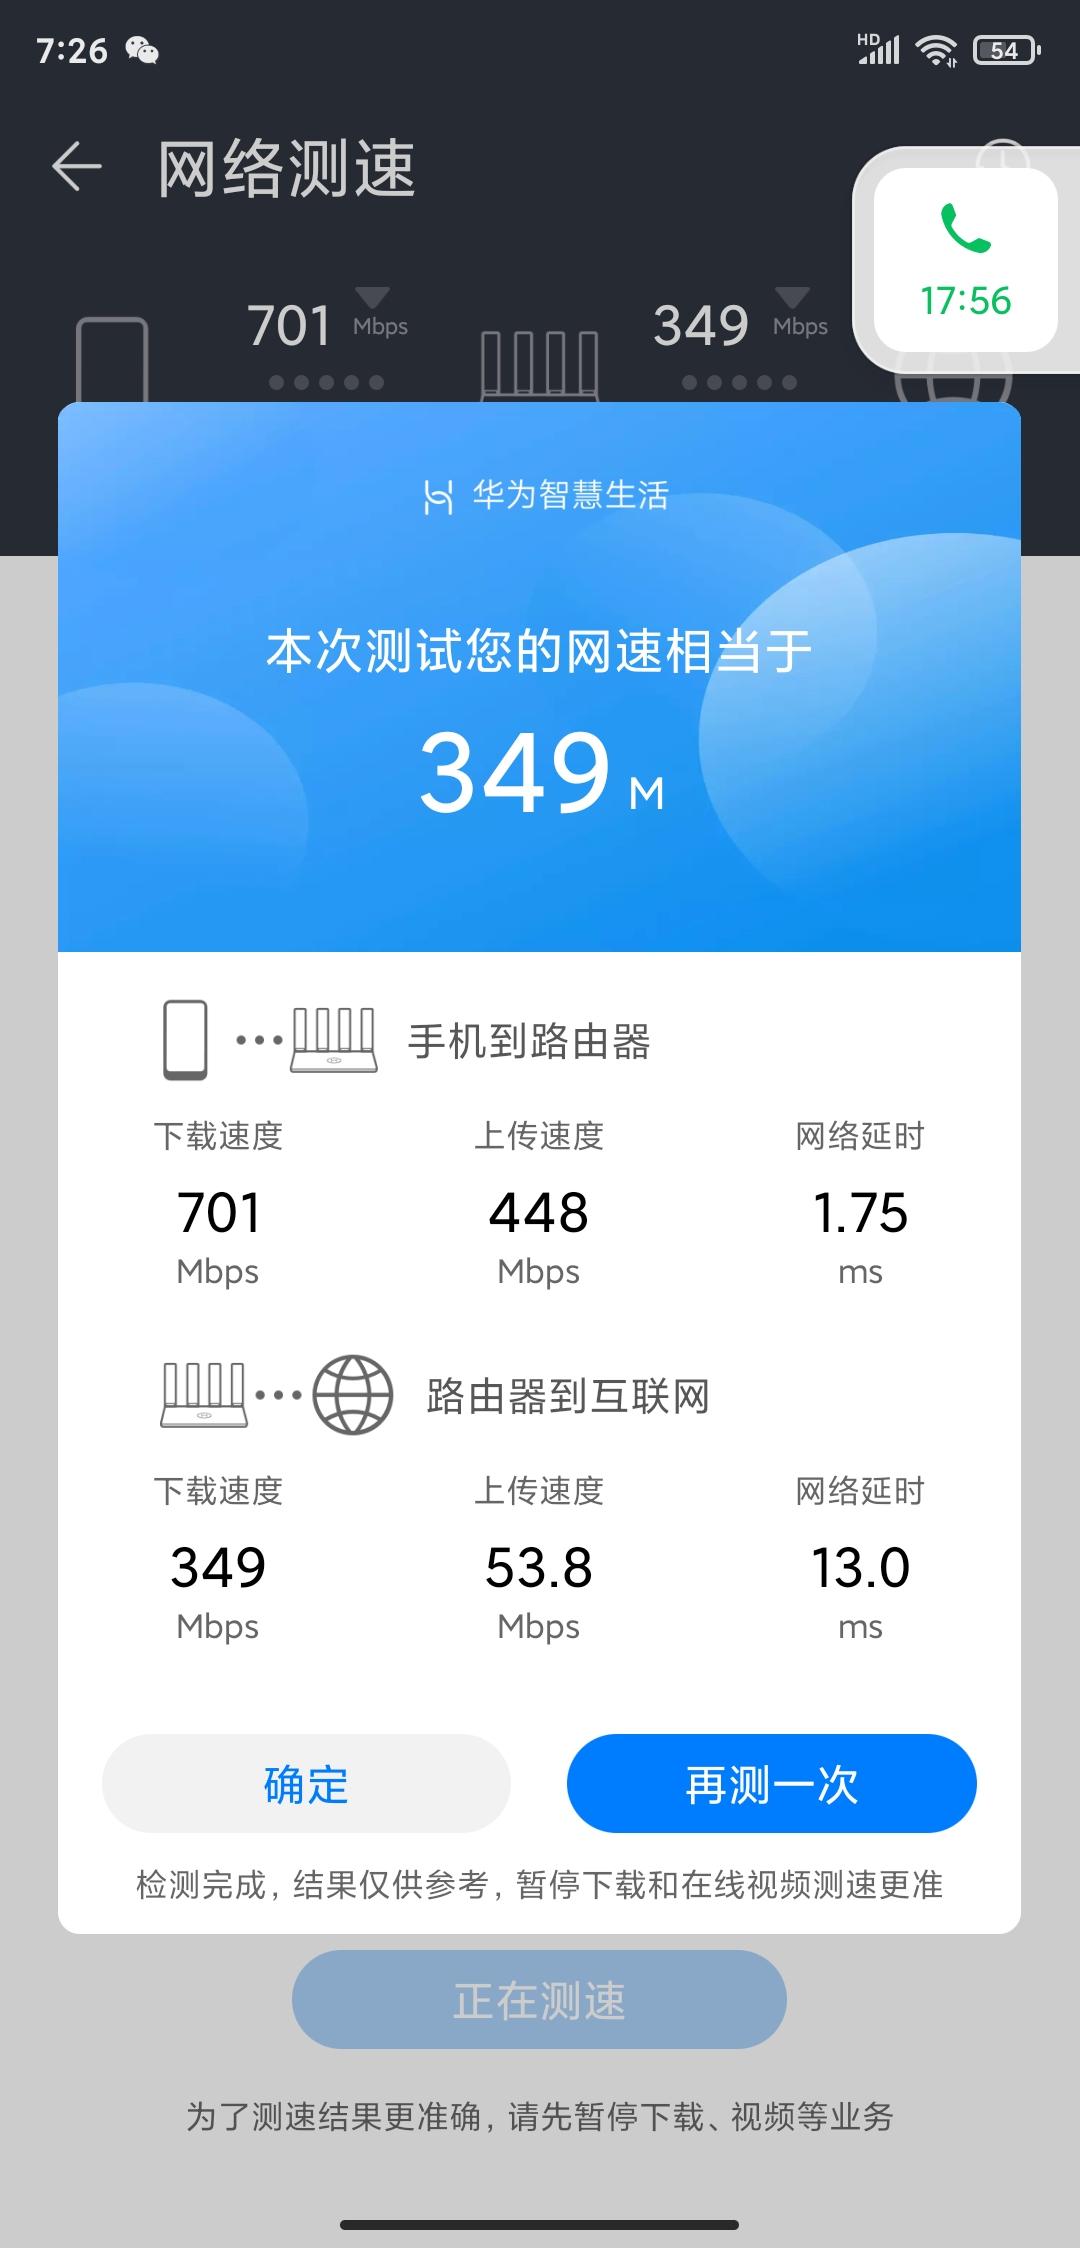 Screenshot_2021-01-15-19-26-24-926_com.huawei.smarthome.jpg